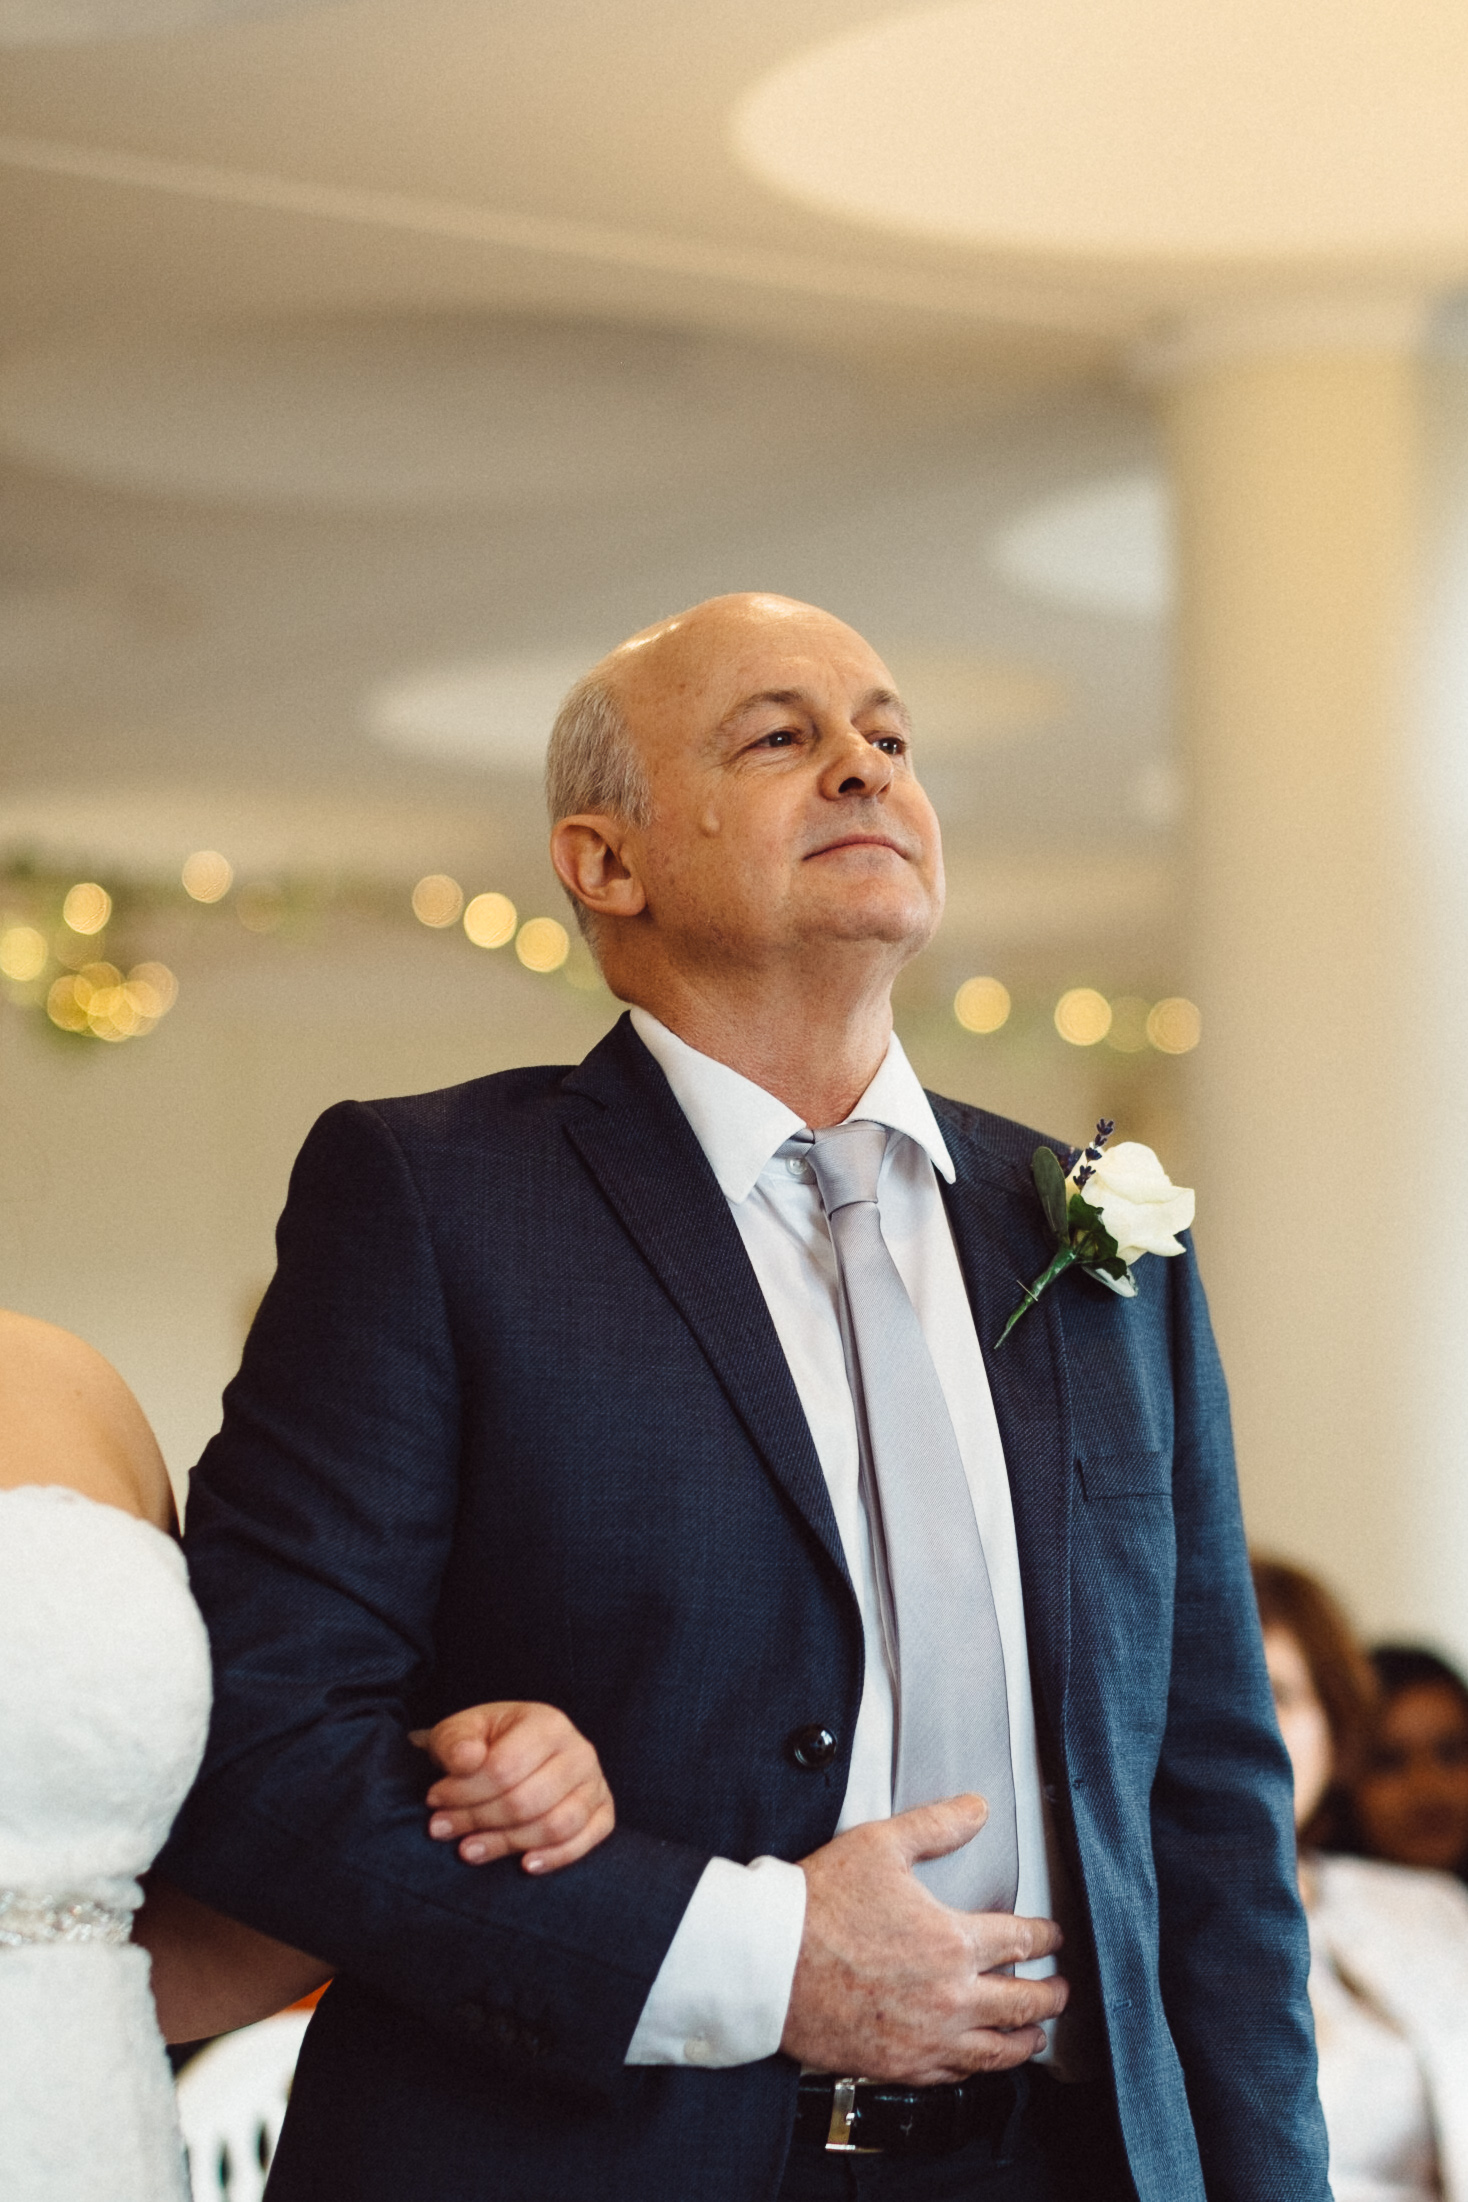 Hereford_wedding_photographer31.jpg